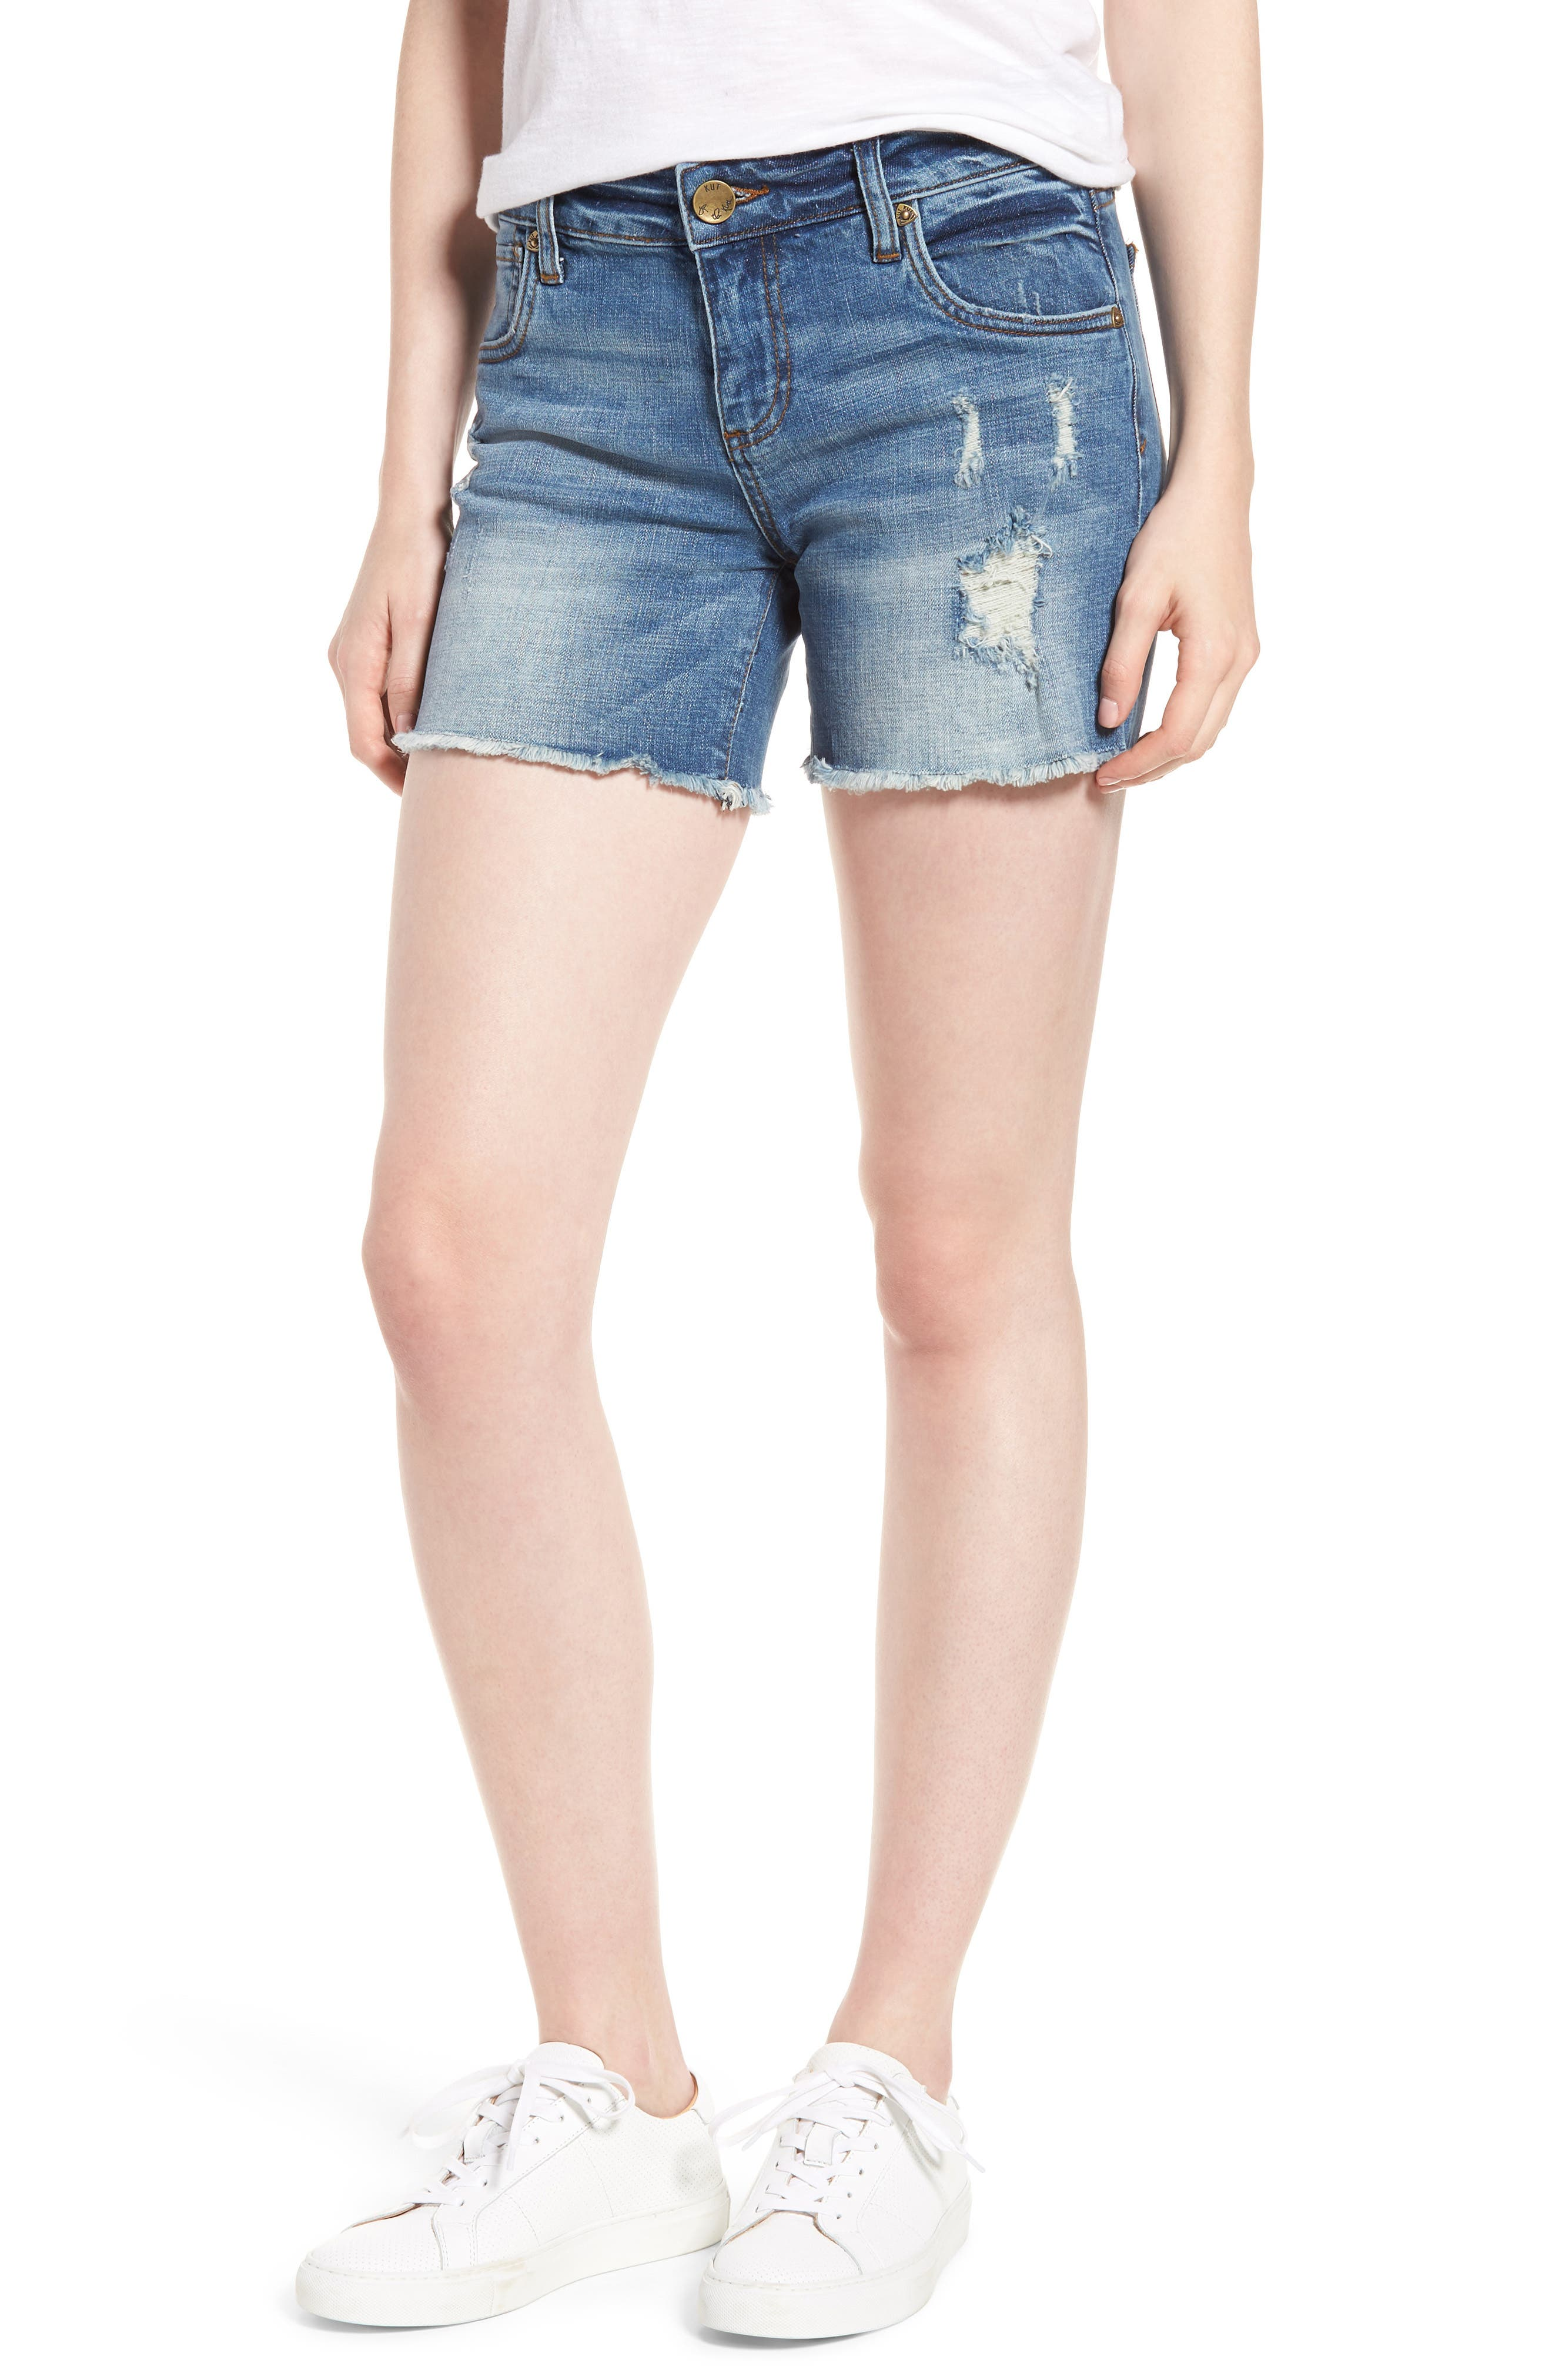 Gidget Distressed Denim Shorts,                         Main,                         color, Constructive